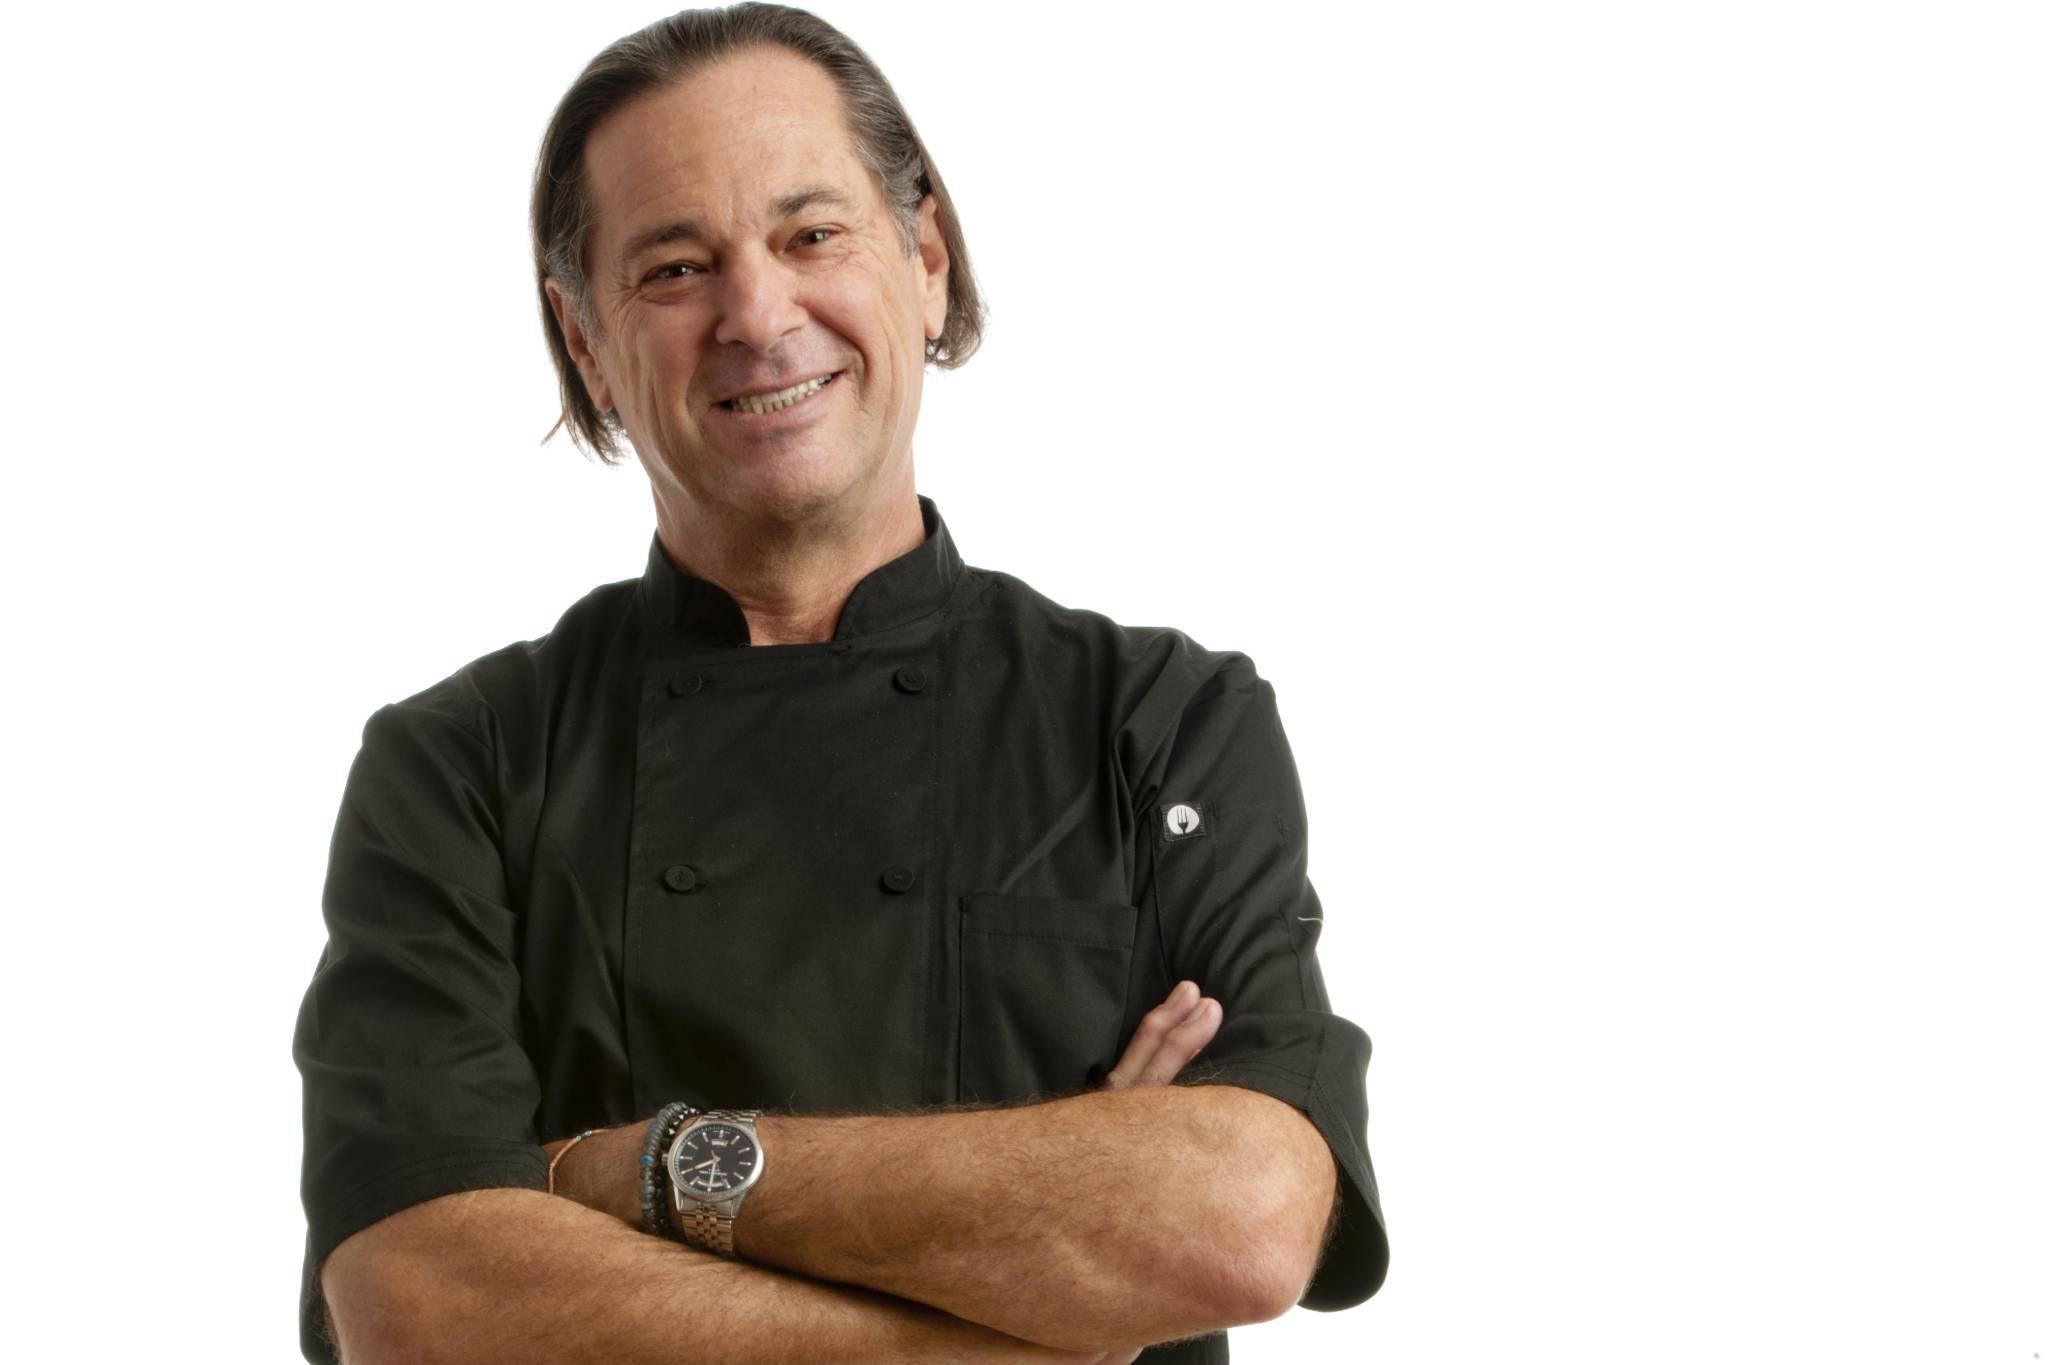 Chef Mark Ellman